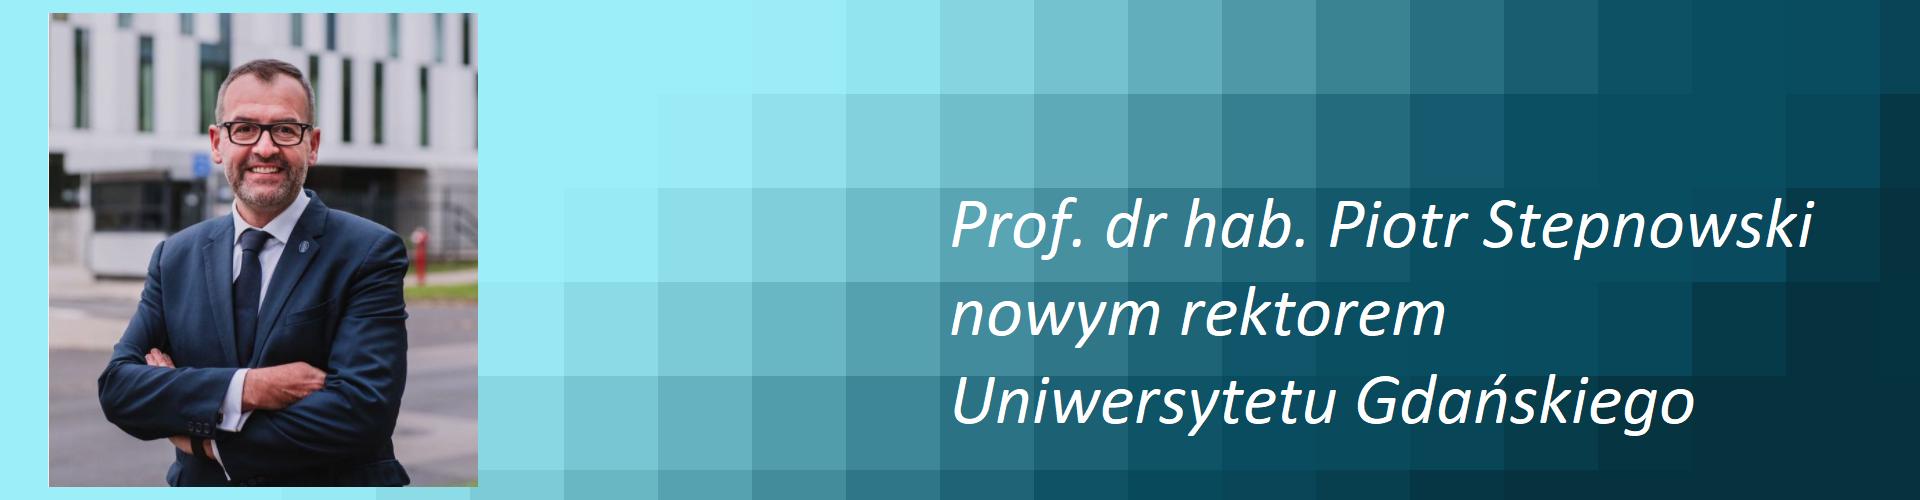 Prof. dr hab. Piotr Stepnowski nowym rektorem UG